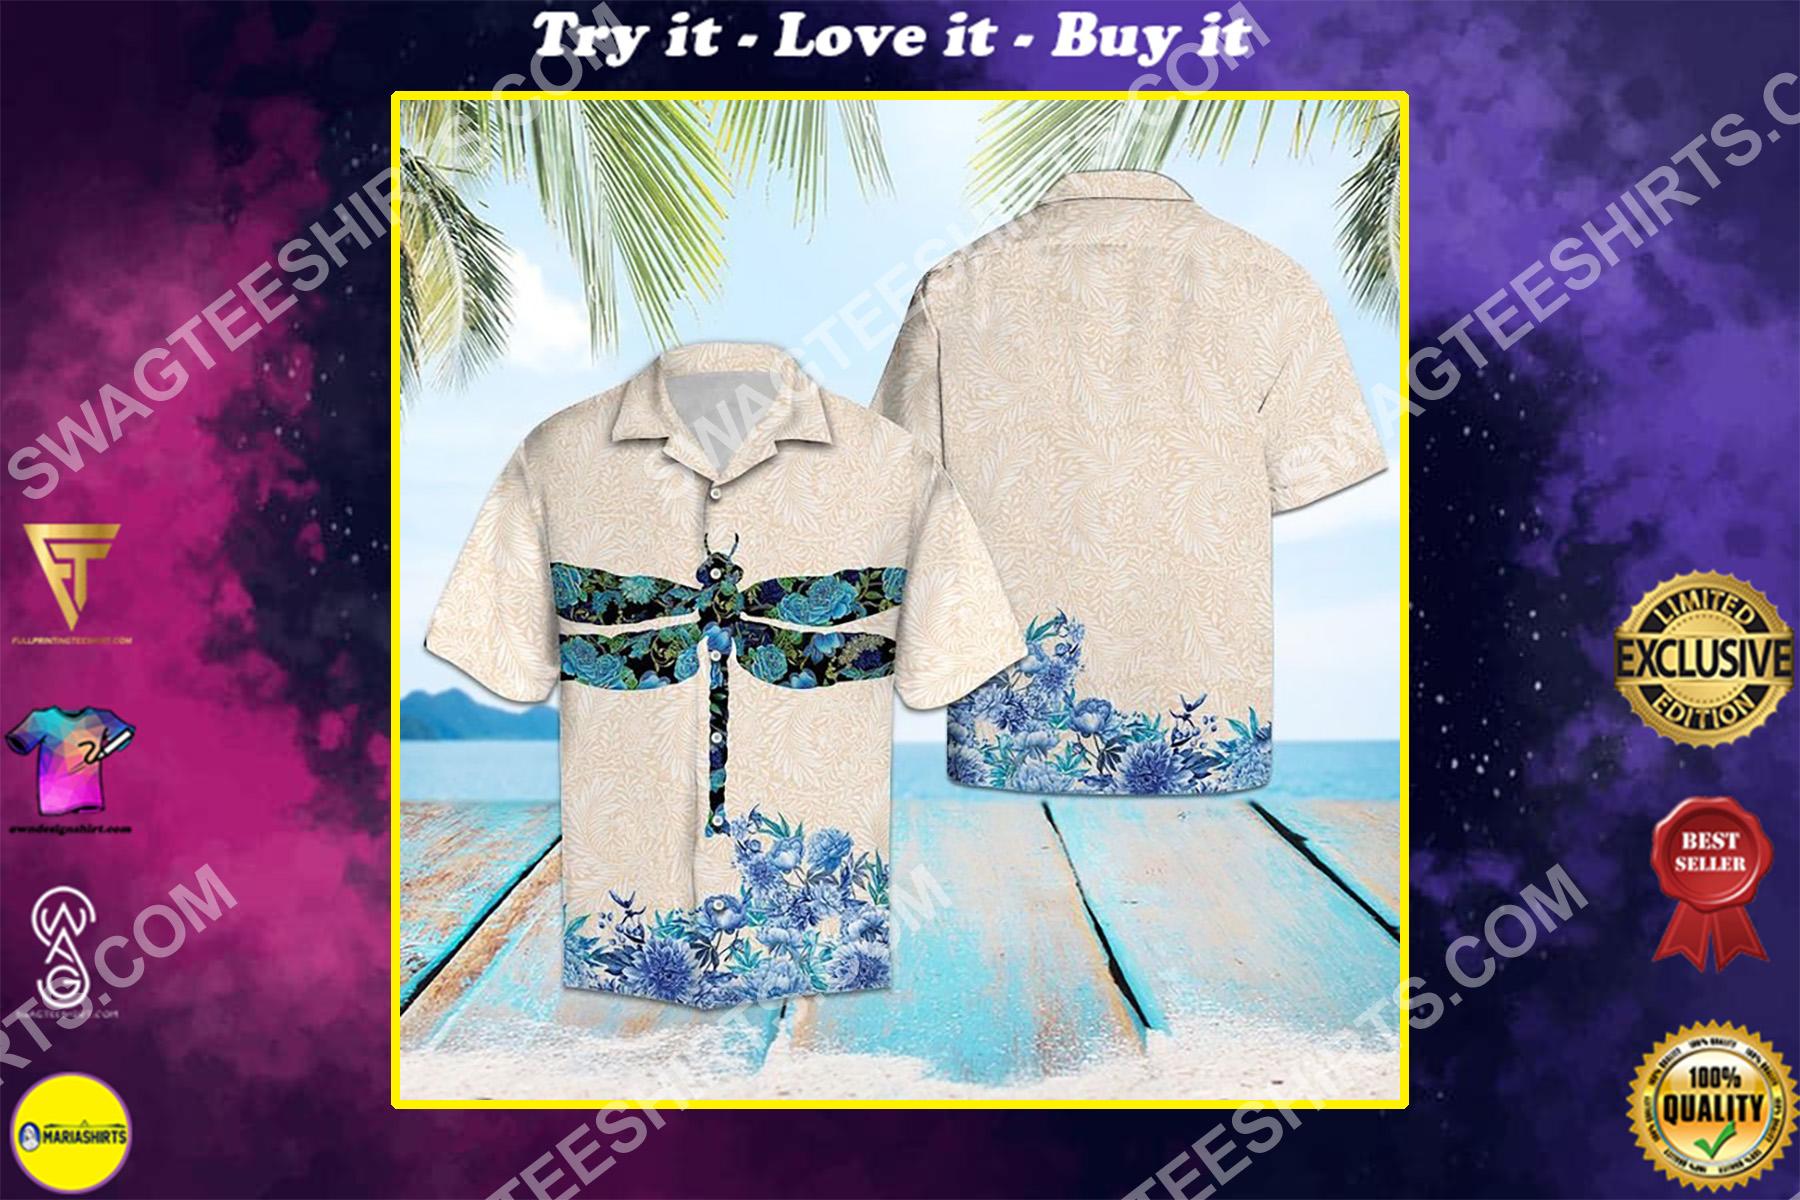 dragonfly flower all over printed hawaiian shirt